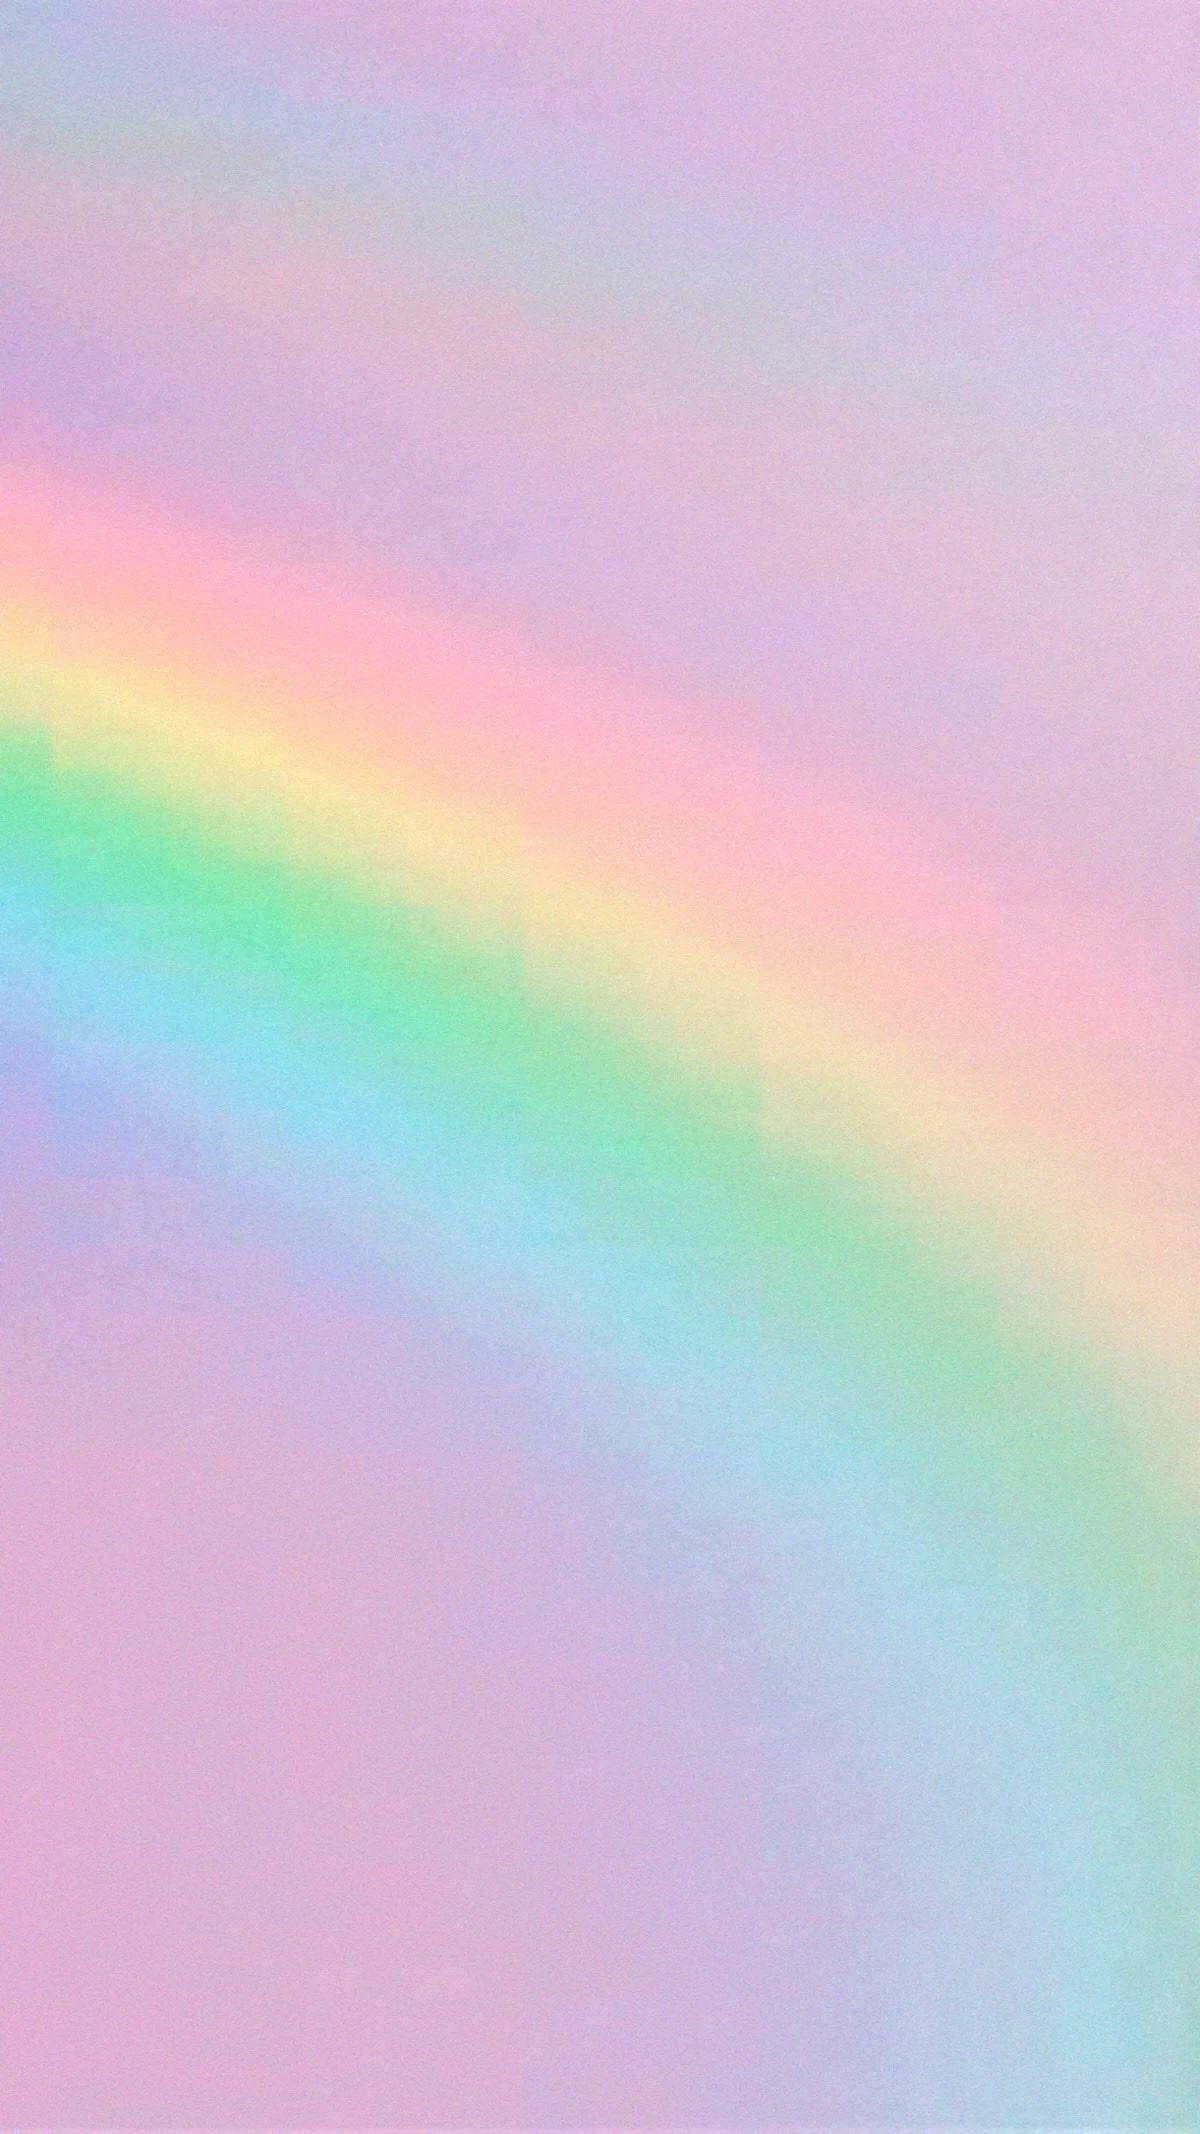 Rainbow Aesthetic Tumblr Wallpapers Top Free Rainbow Aesthetic Tumblr Backgrounds Wallpaperaccess